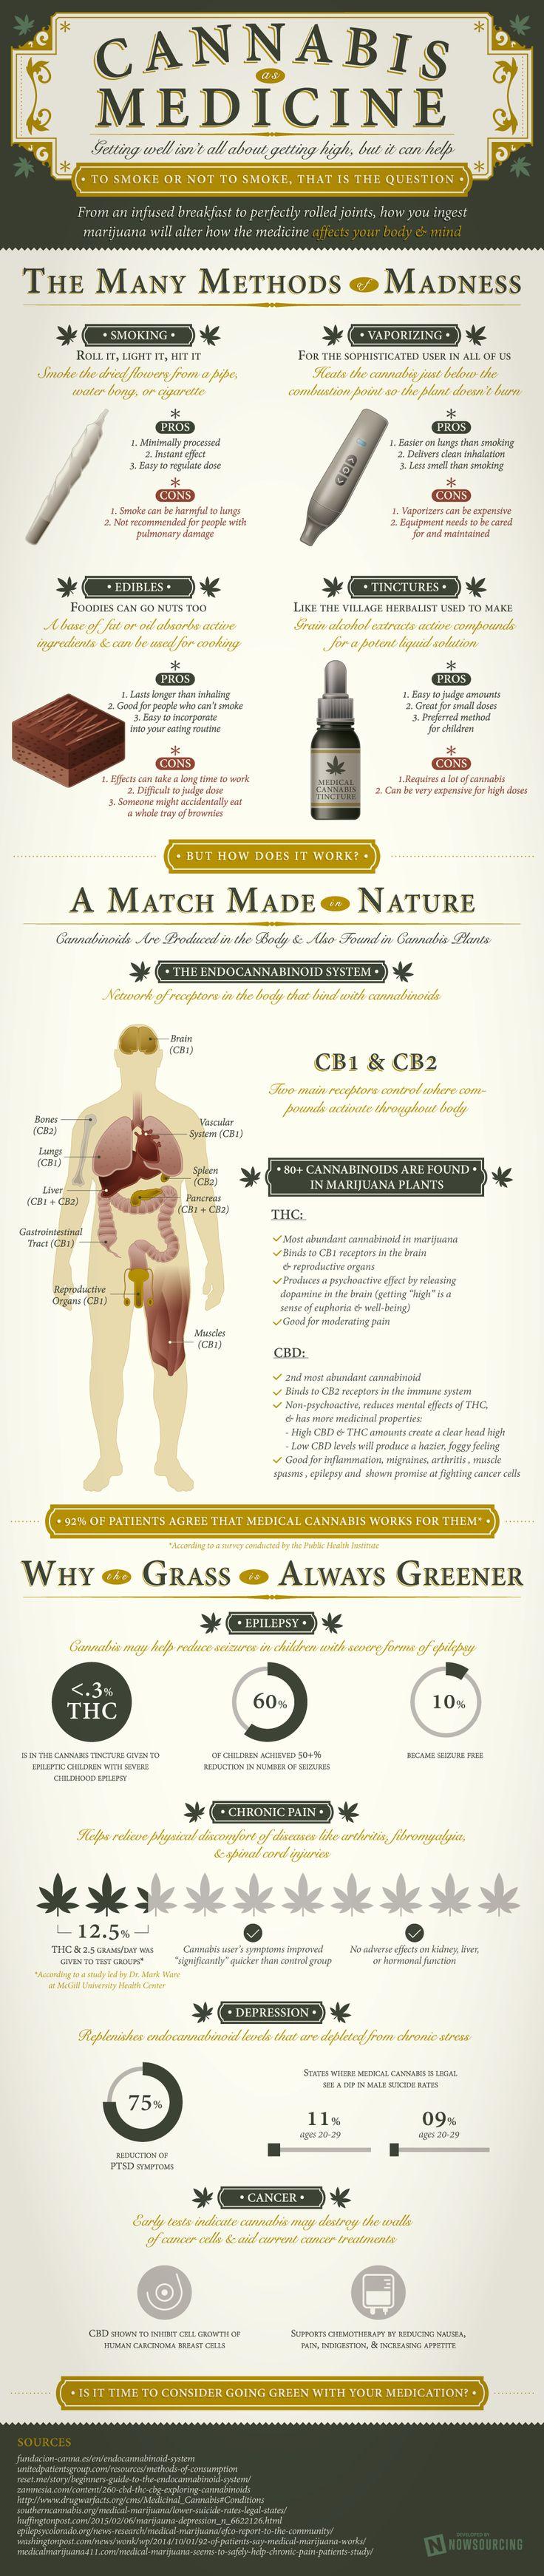 Cannabis as Medicine #Infographic #Health #Medicine